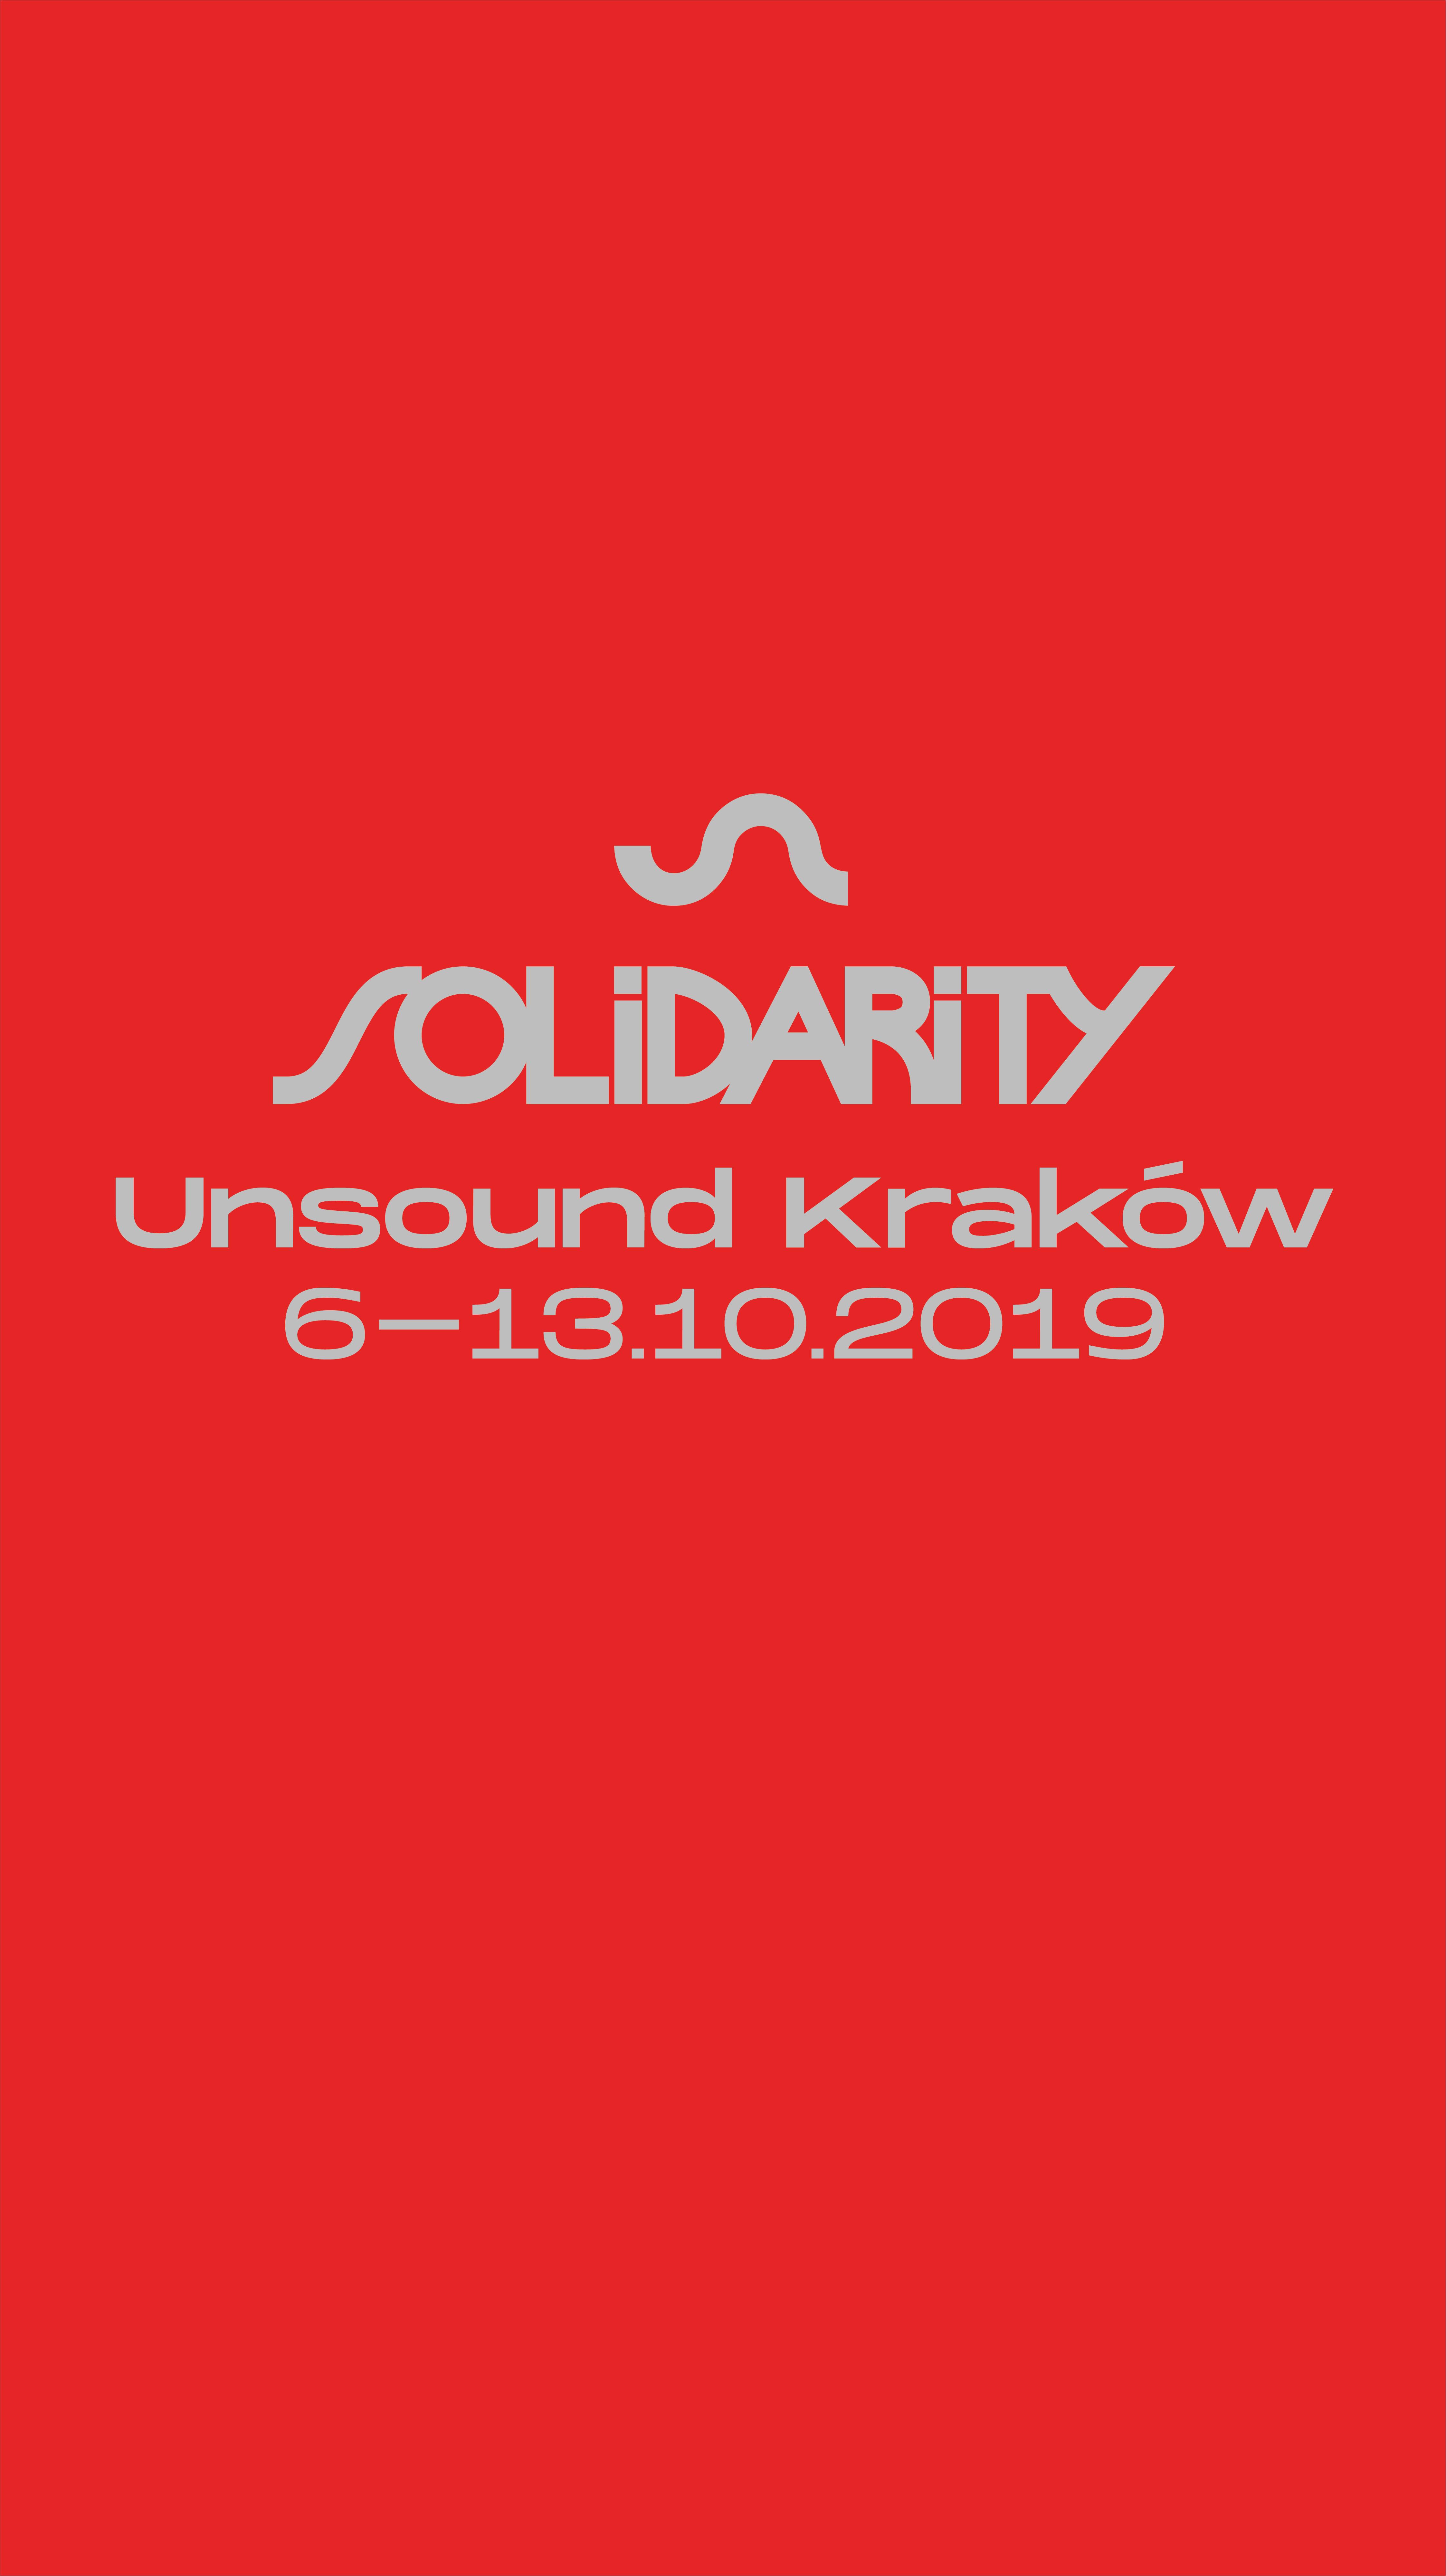 Unsound Kraków 2019: Solidarity